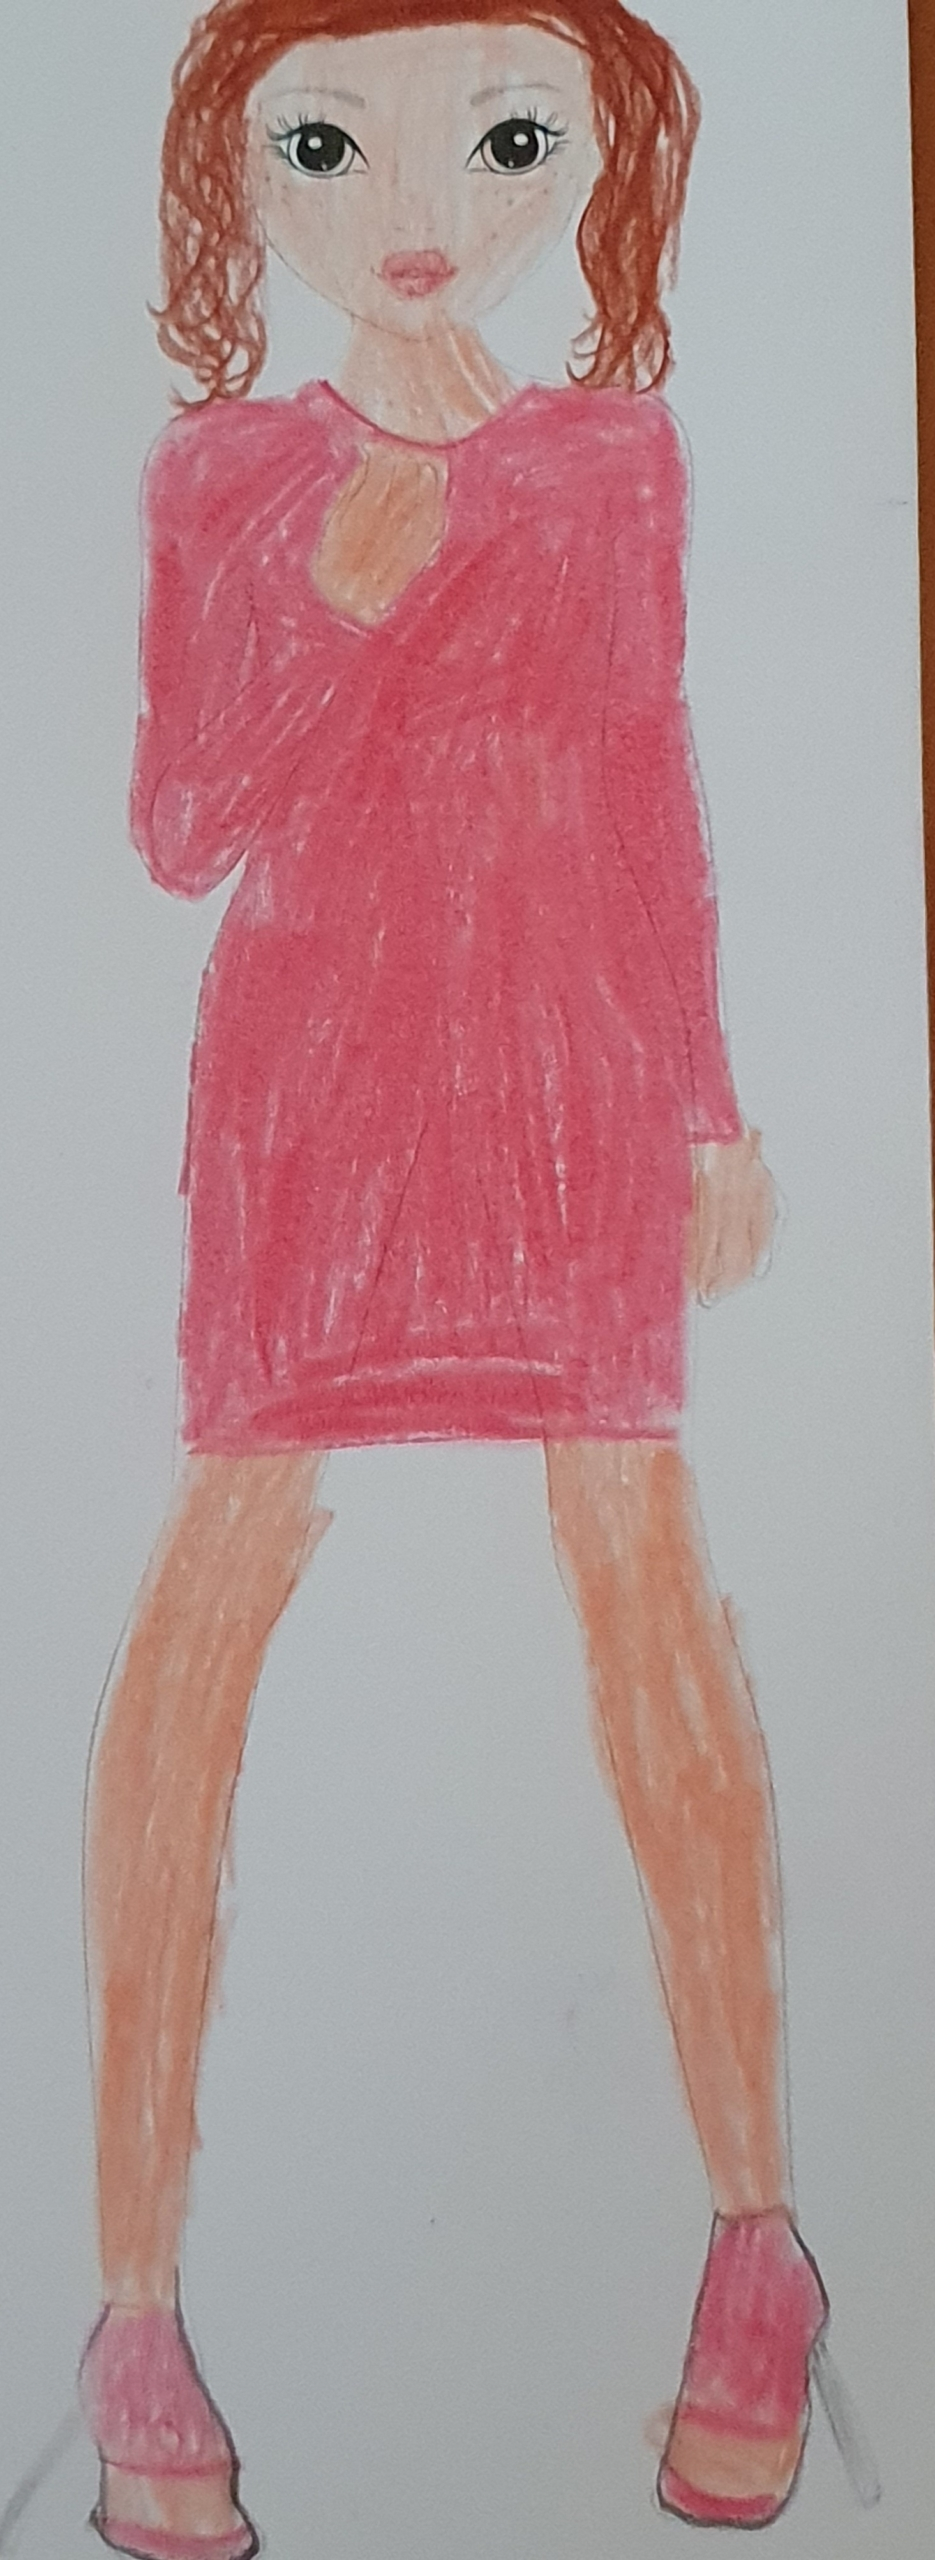 Anastasia  P., 11 Jahre, aus Achim